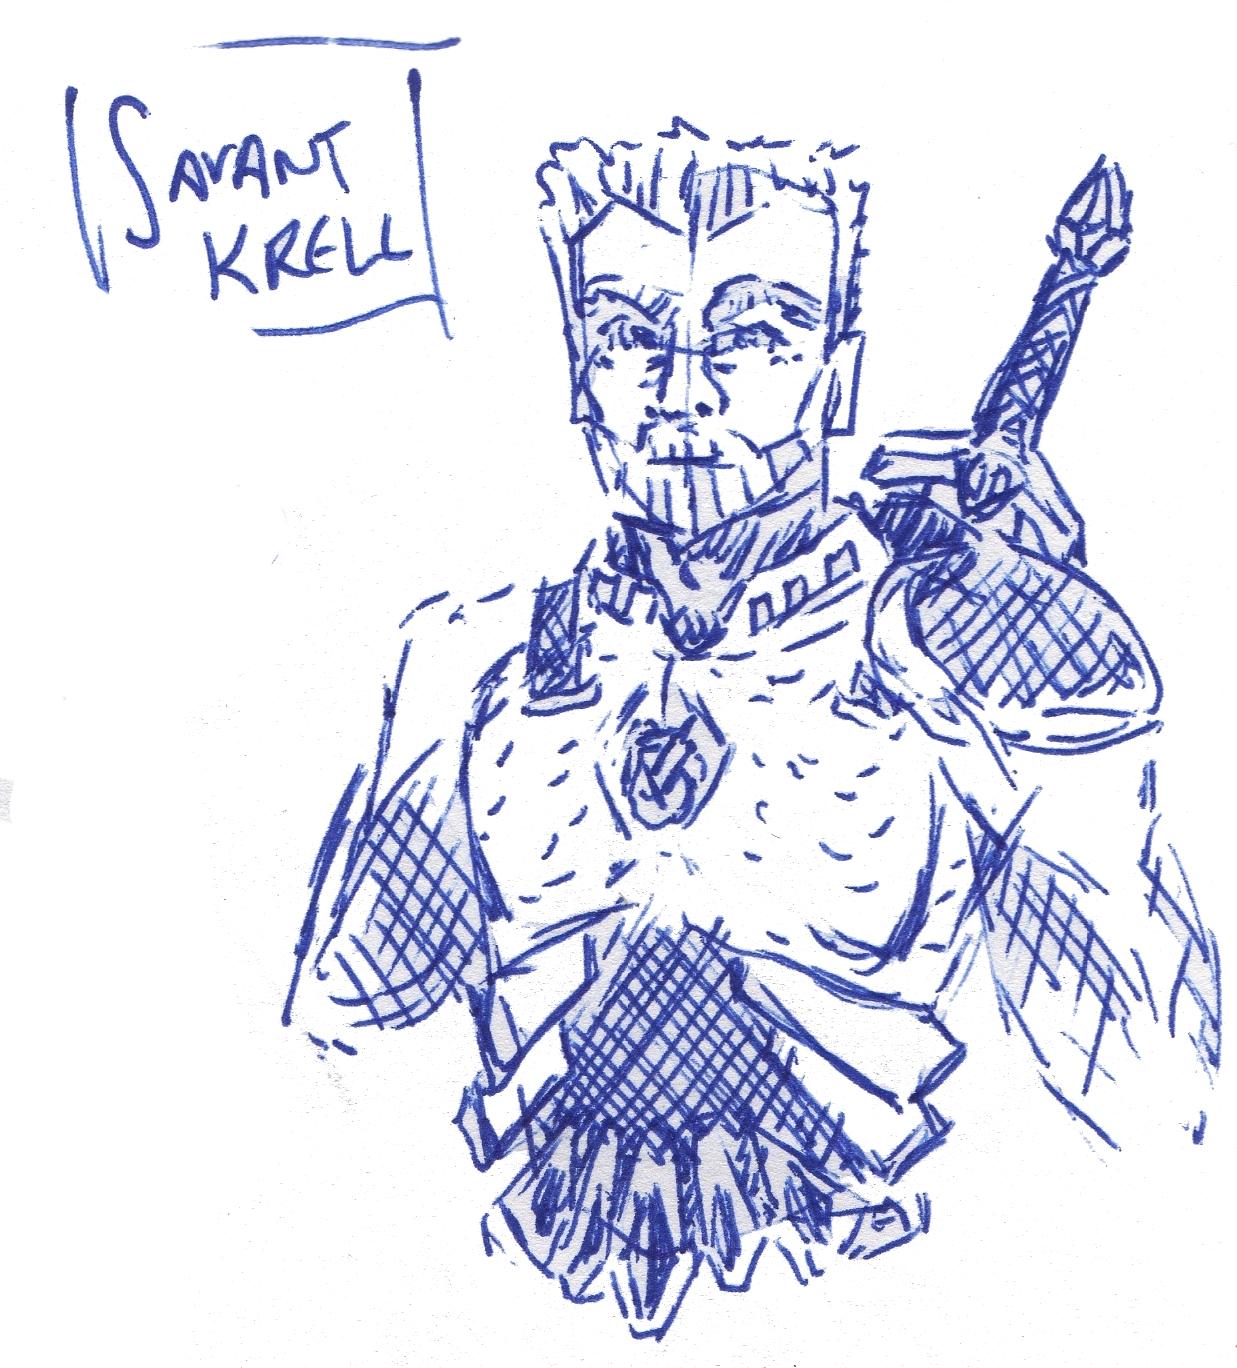 savant krell sketch